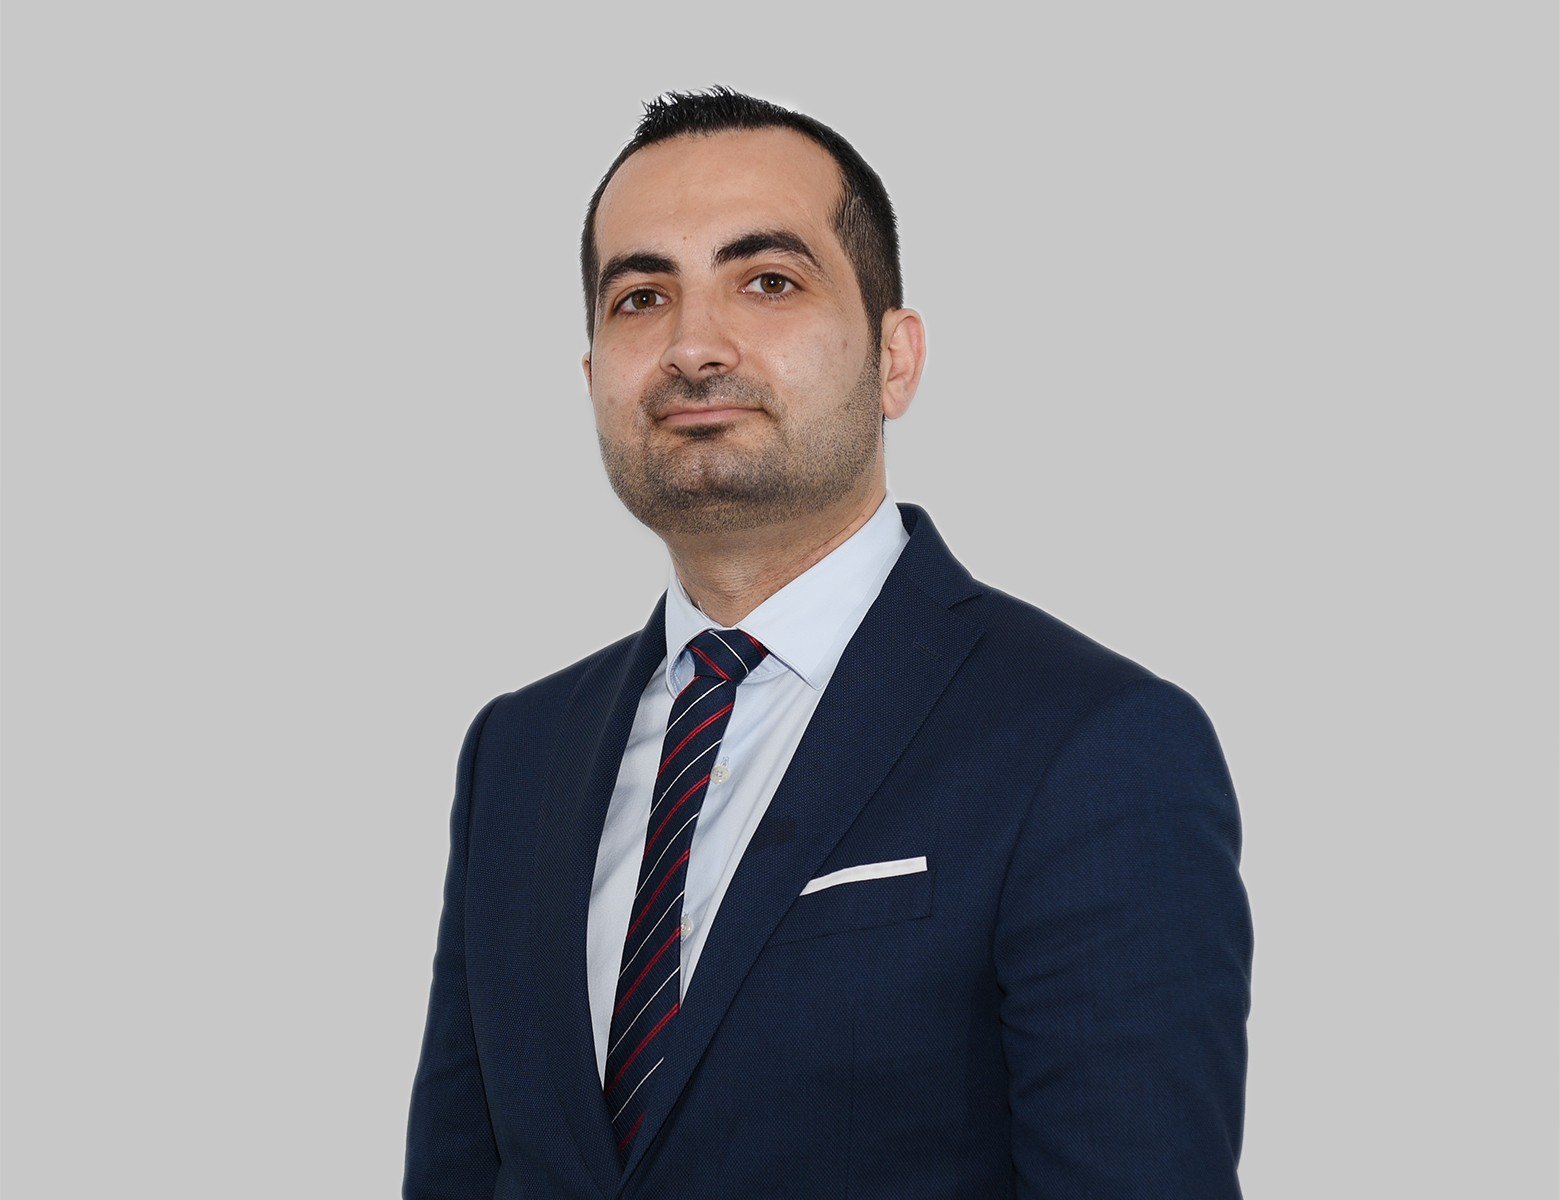 Behzad Torabi